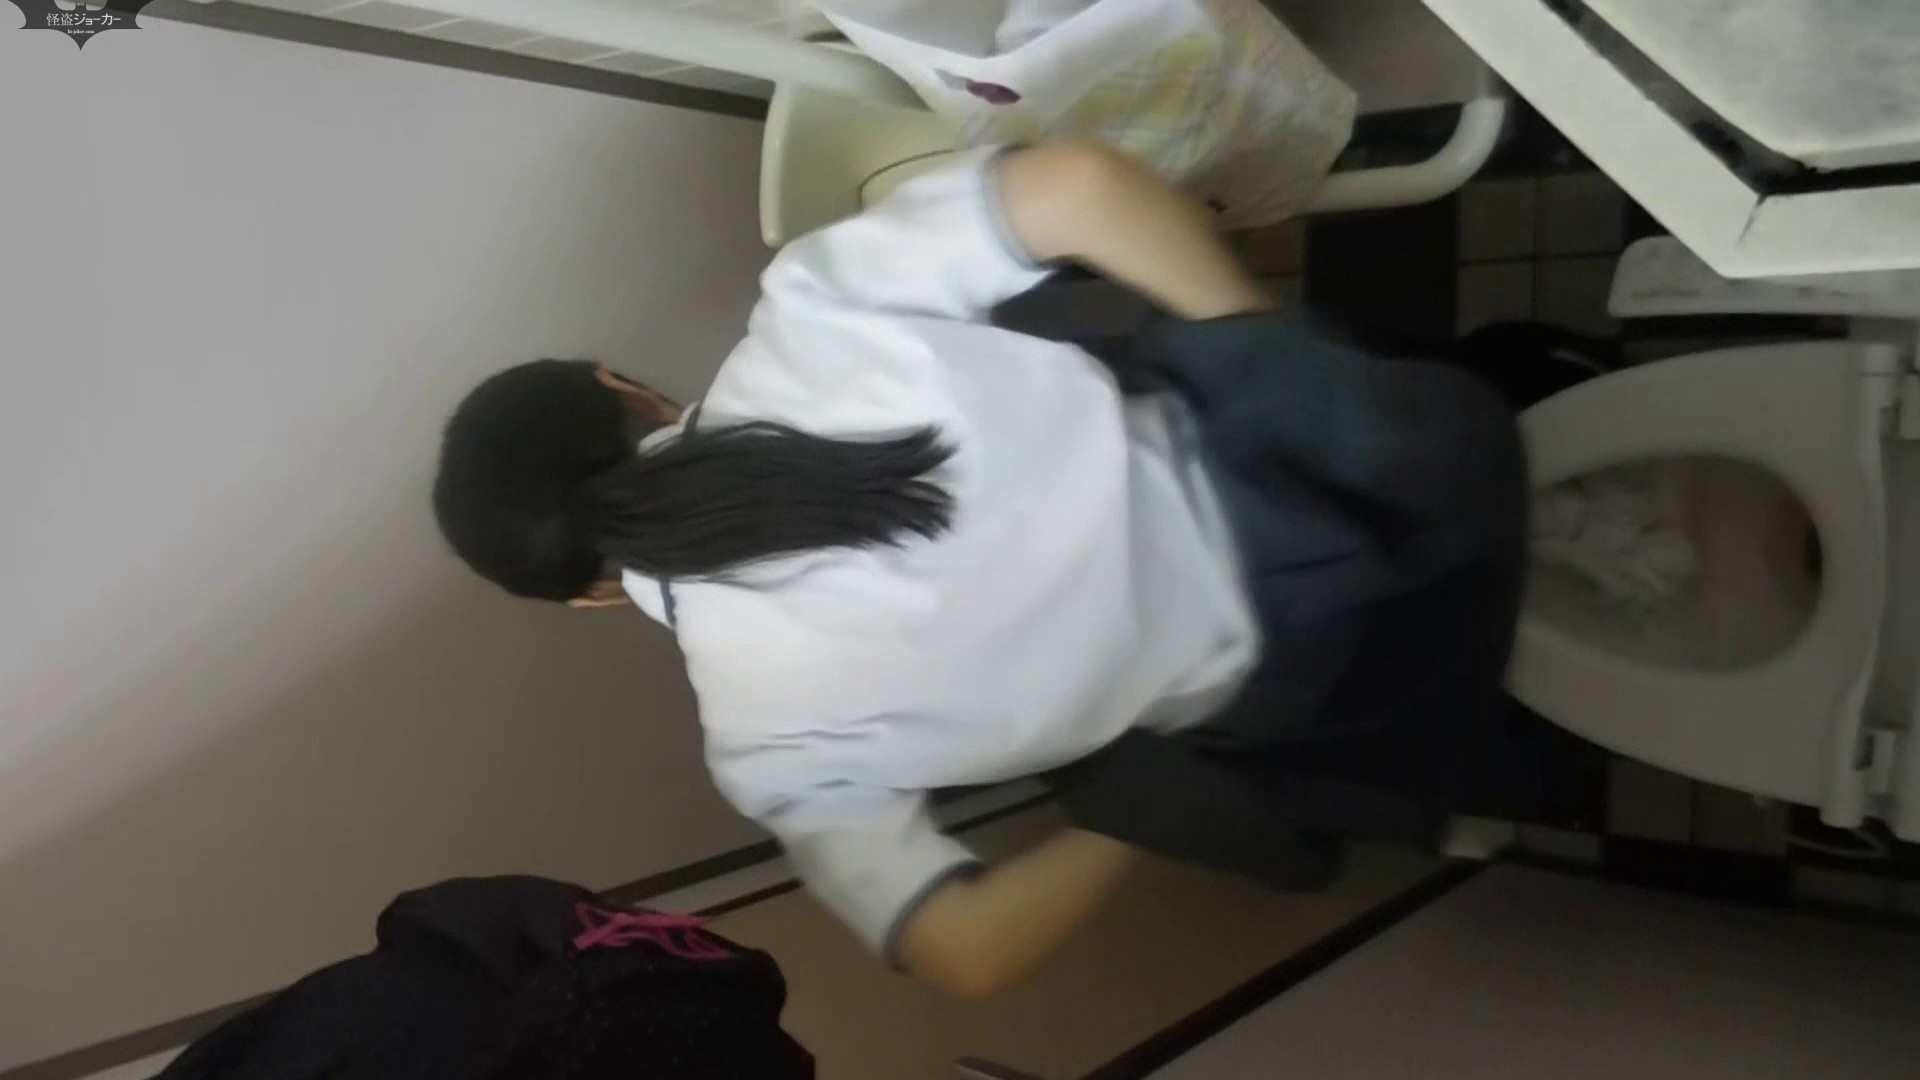 無修正エロ動画|化粧室絵巻 駅舎編 VOL.25|怪盗ジョーカー